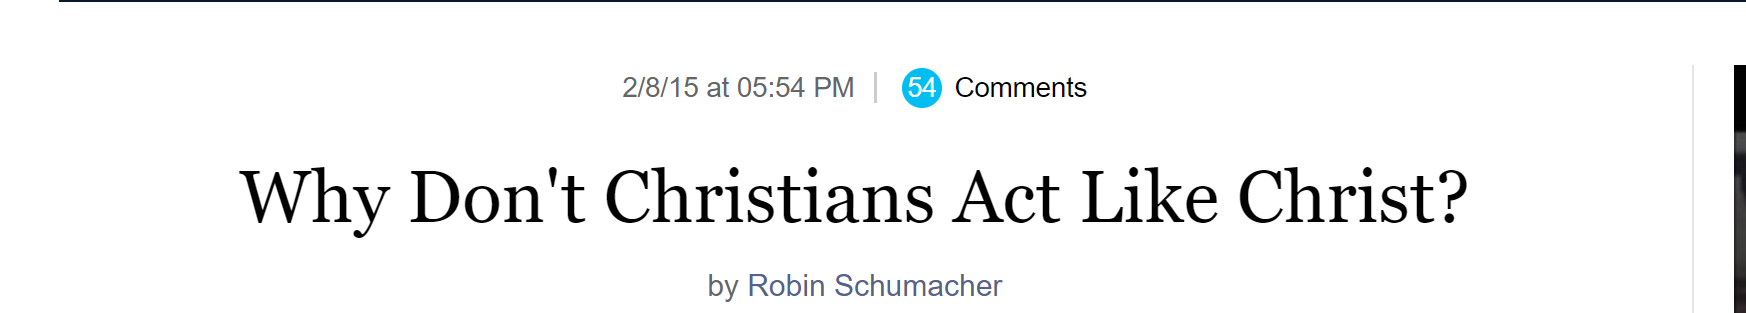 christlike headline1.png